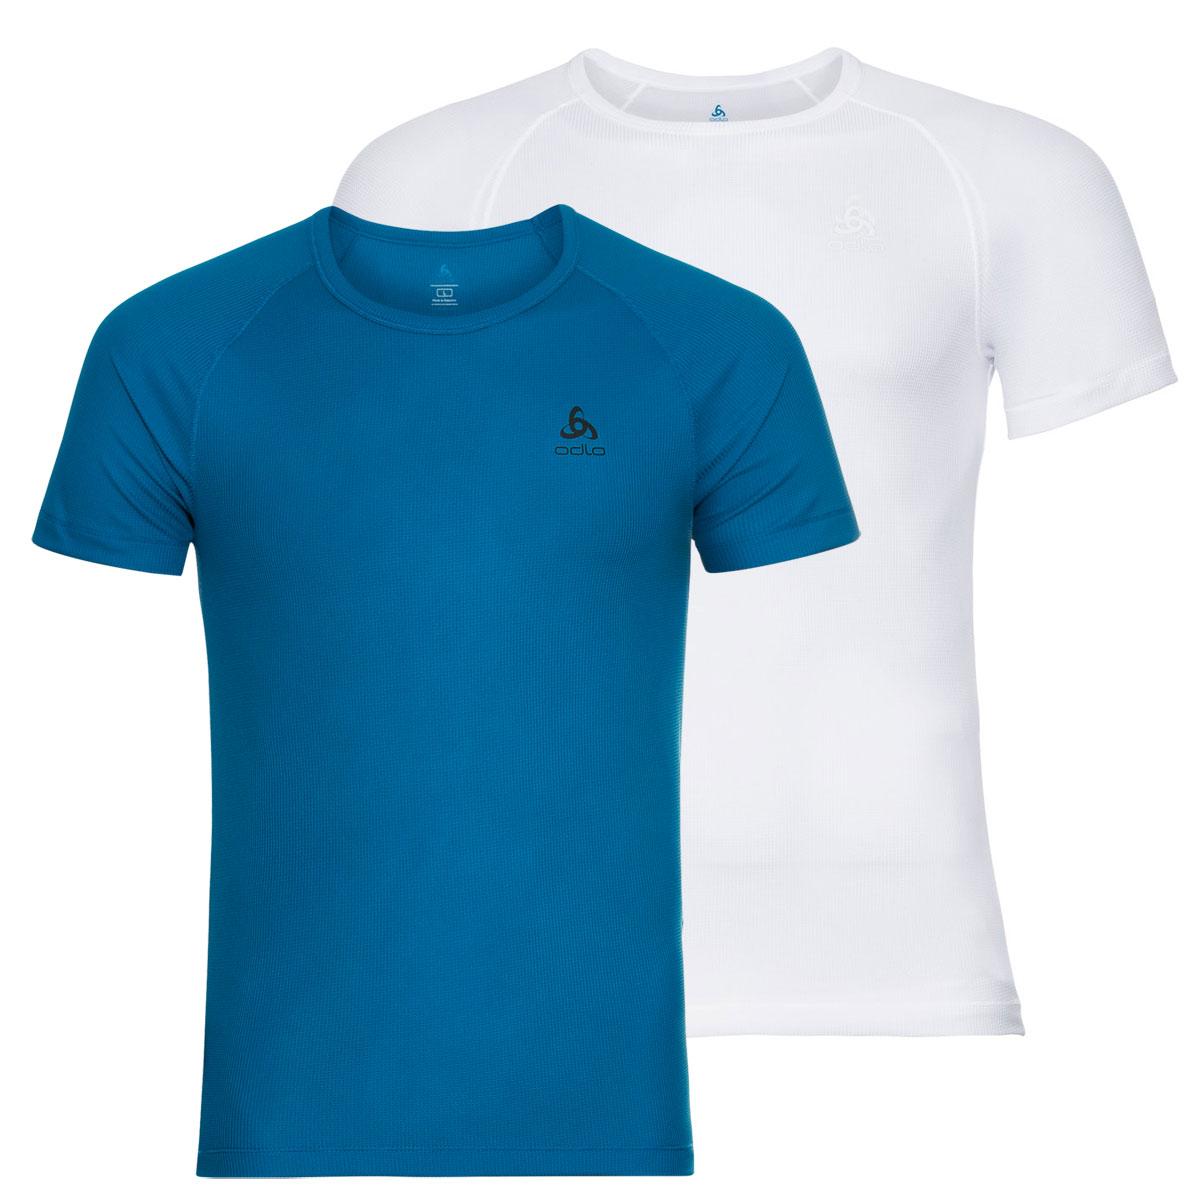 Produktbild von Odlo Herren ACTIVE CUBIC LIGHT T-Shirt Doppelpack 192282 - 10755 white - mykonos blue